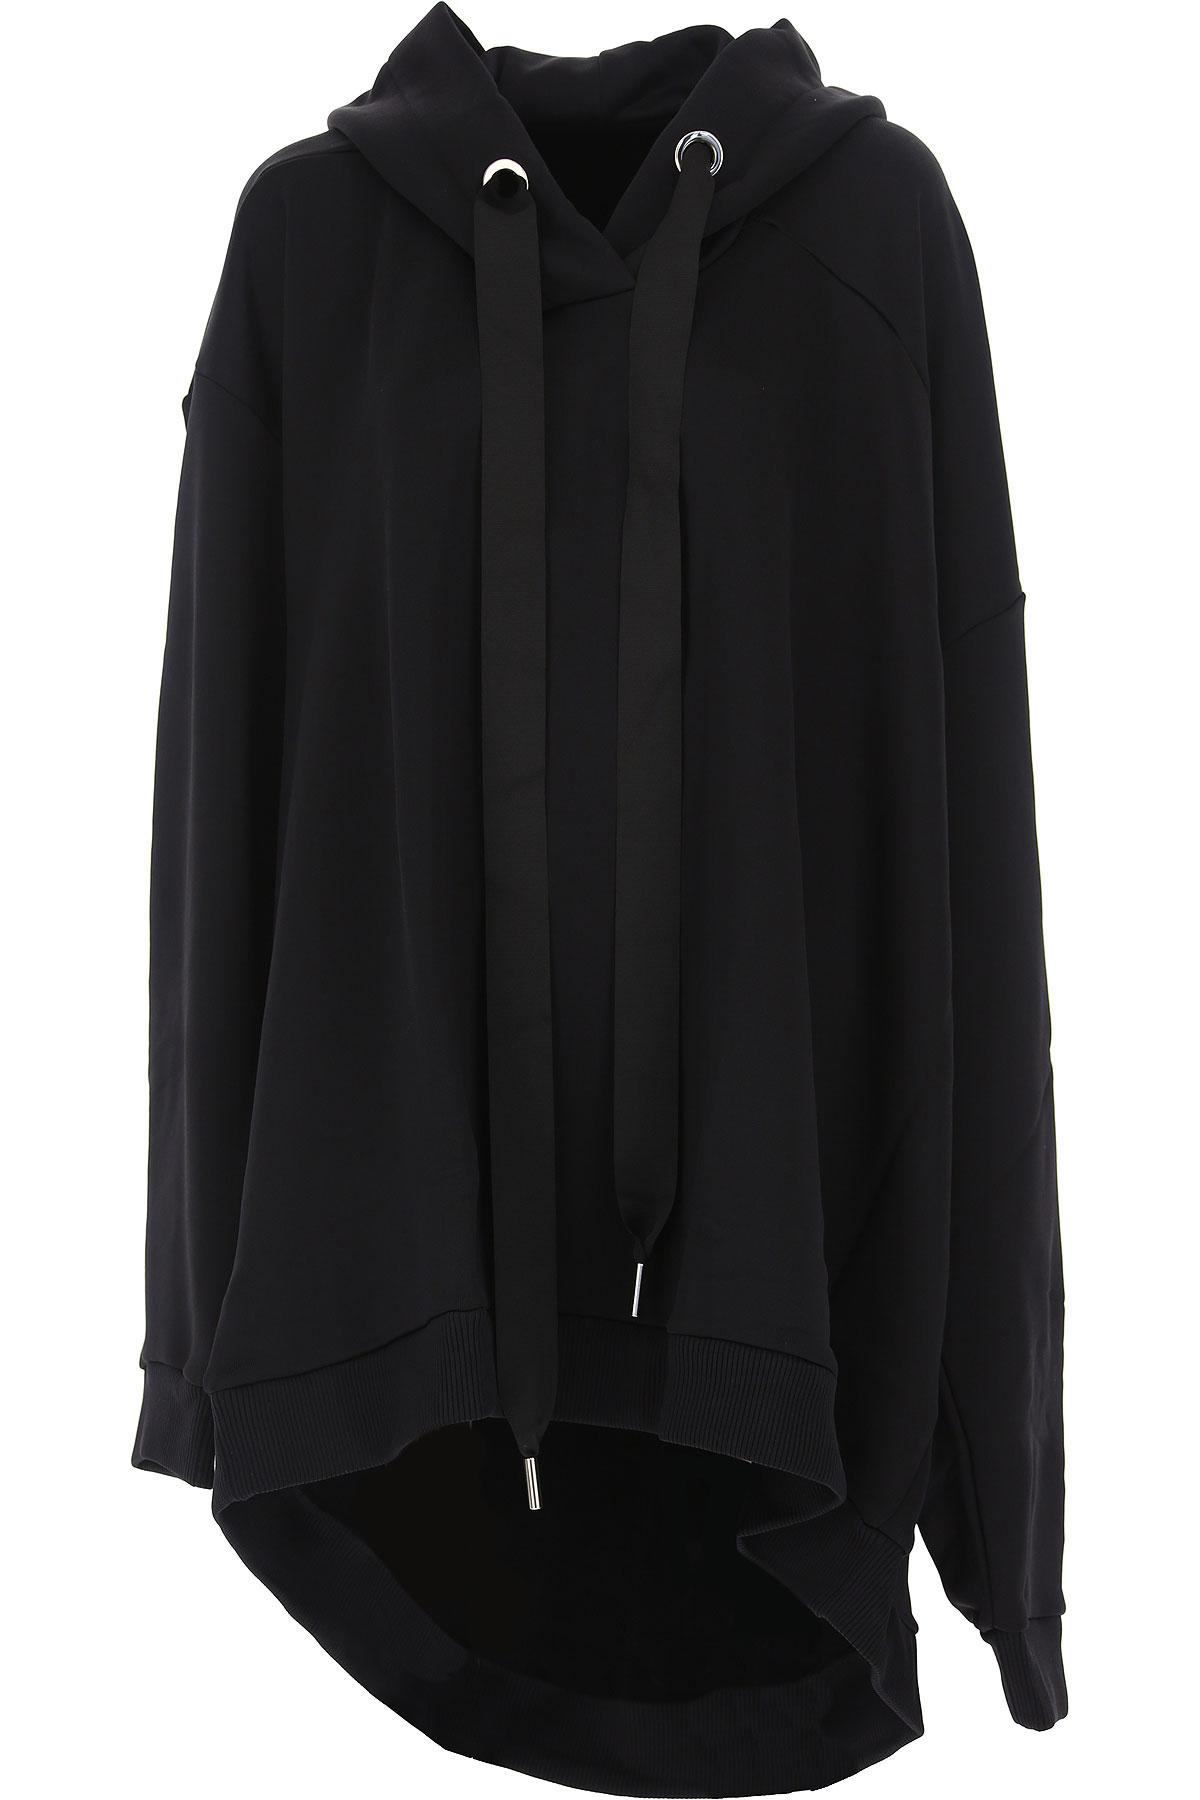 Image of Marques Almeida Sweatshirt for Women On Sale, Black, Cotton, 2017, 2 4